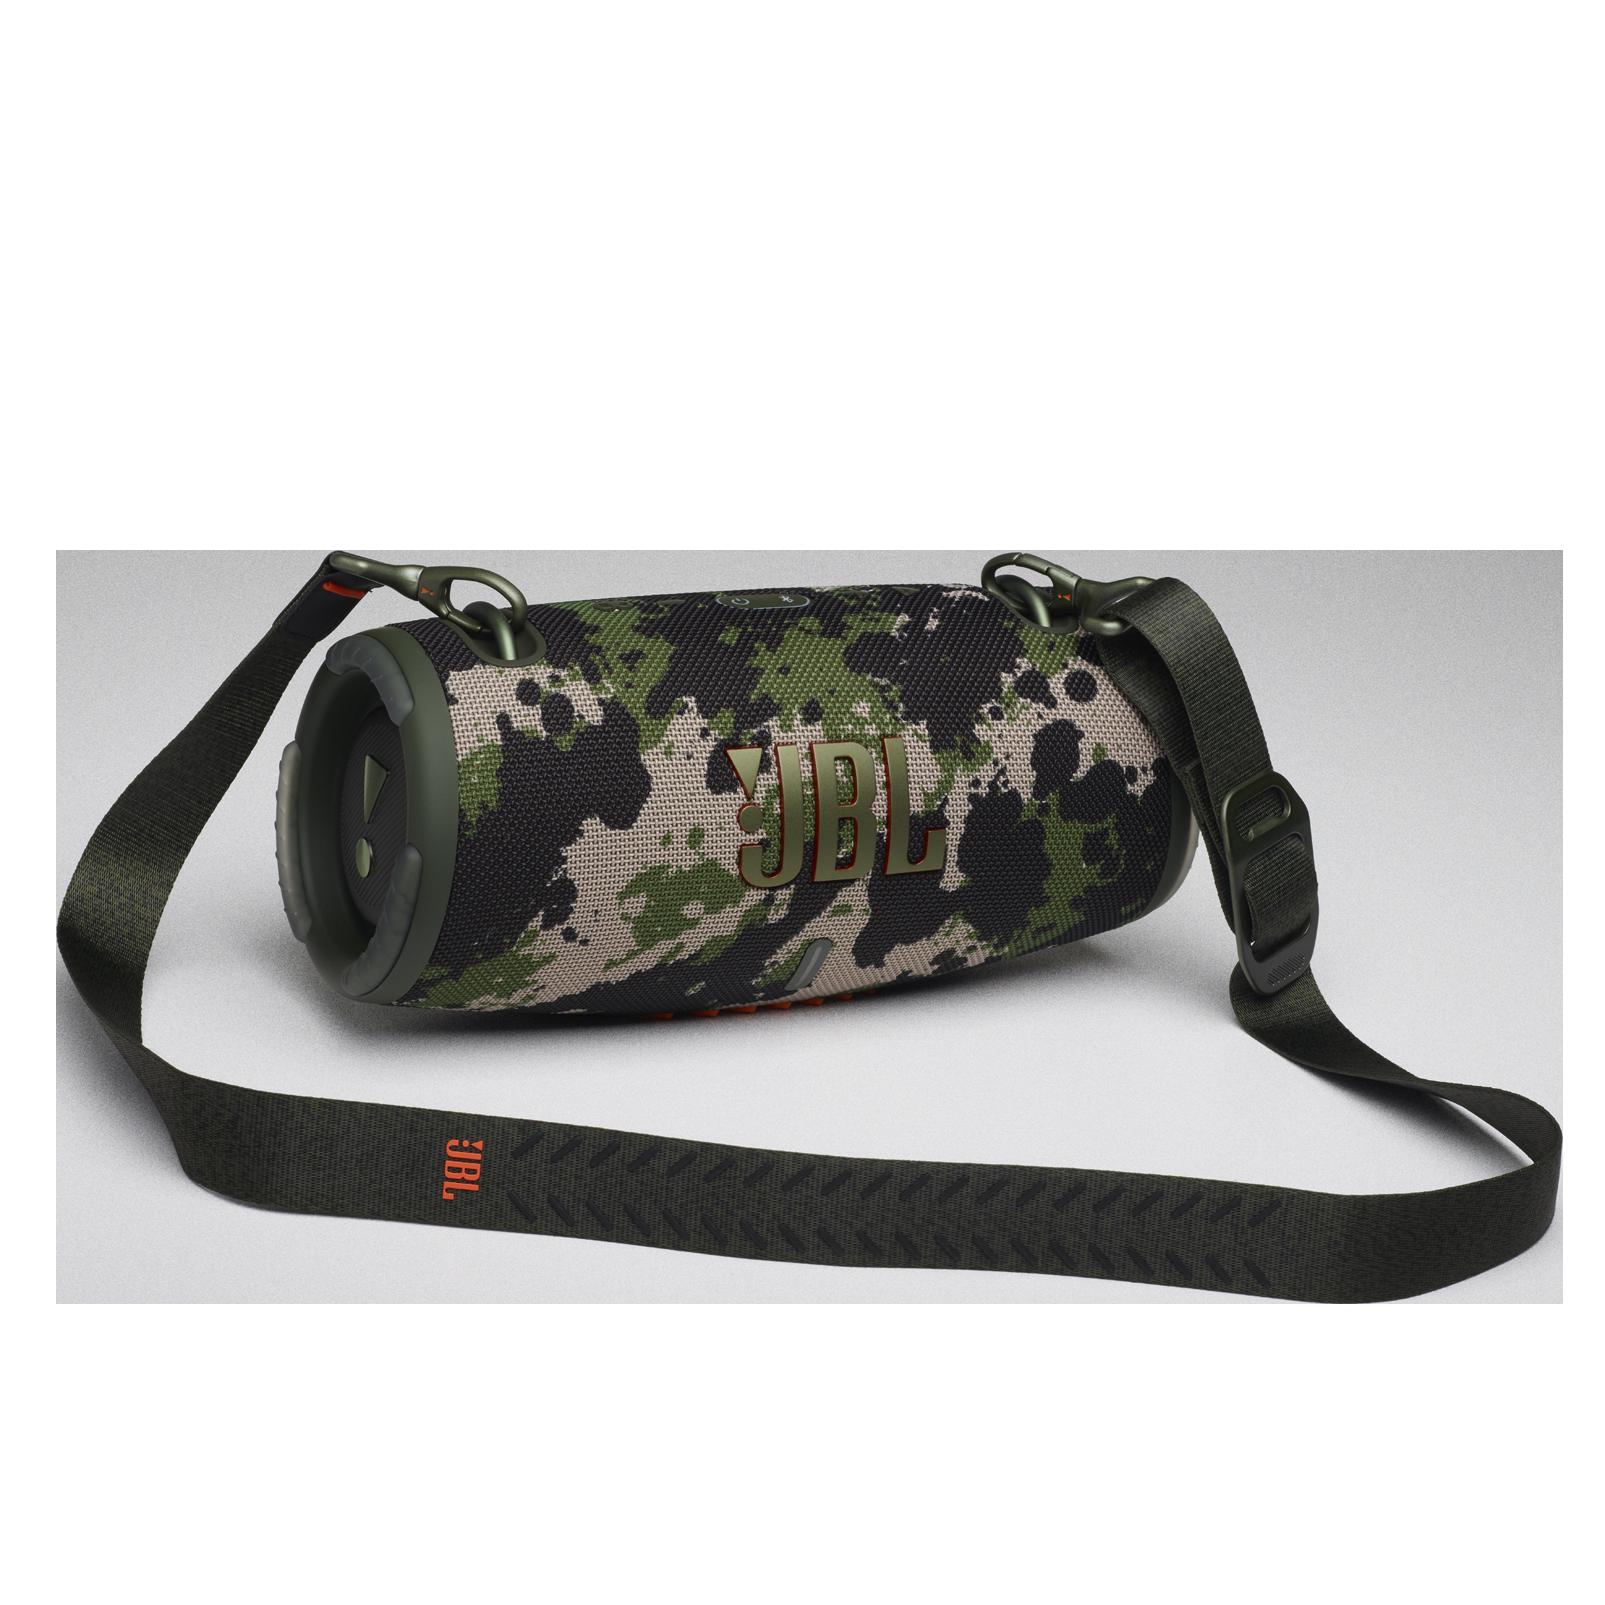 JBL Xtreme 3 - Black Camo - Portable waterproof speaker - Detailshot 1